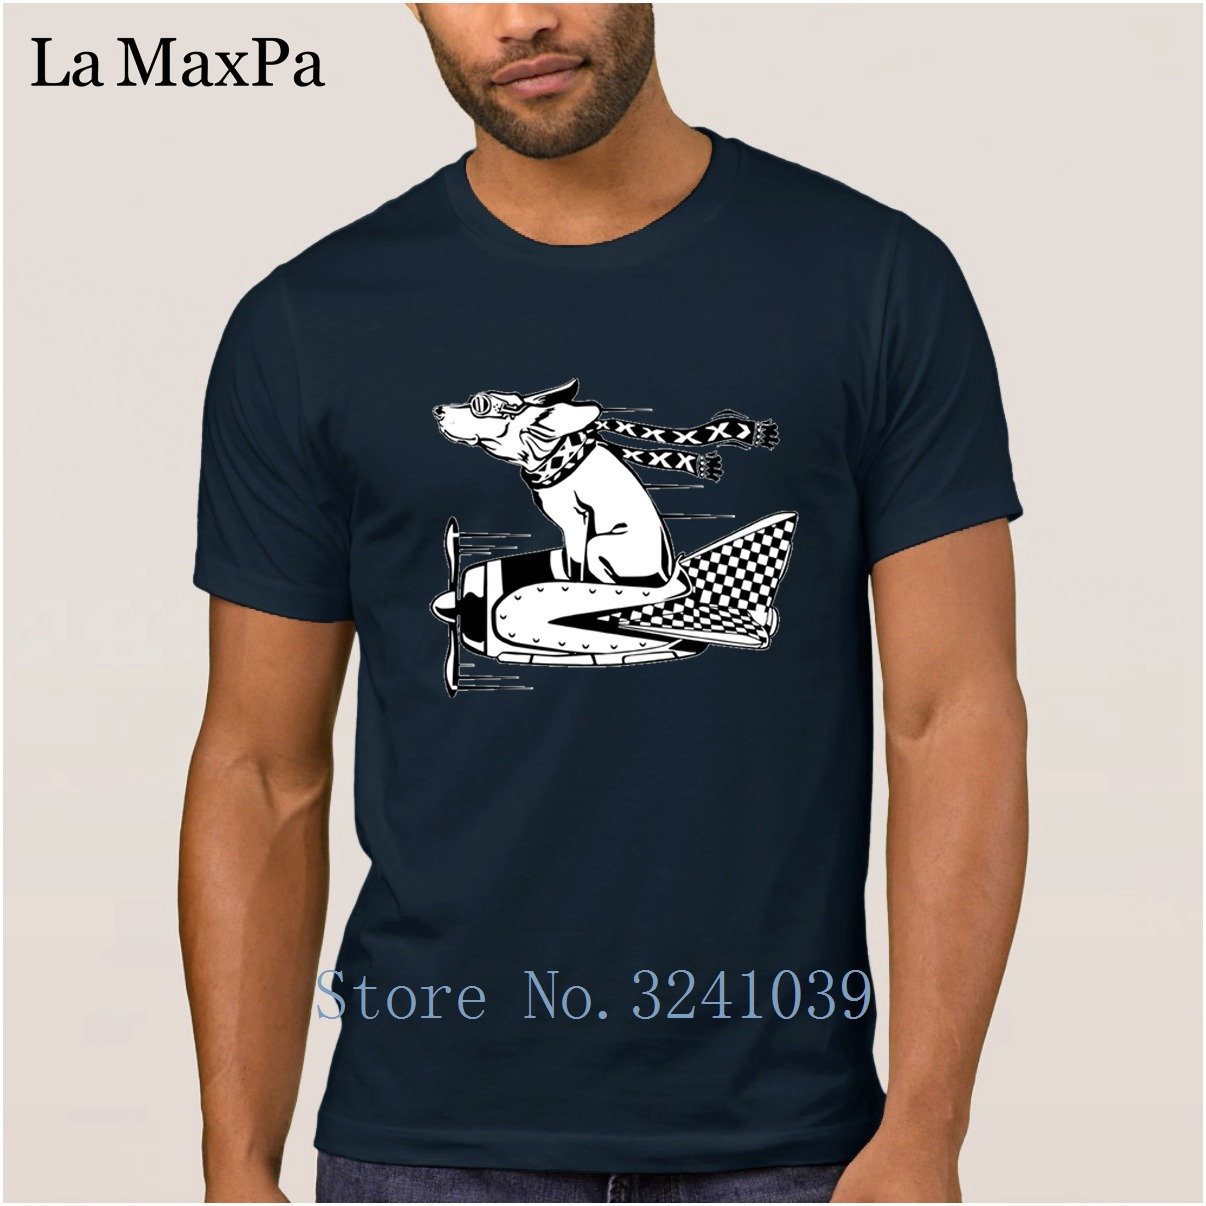 Create Fashion T Shirt Men Short Sleeve 2018 Men's Tshirt Canine Aviator T-Shirt Gift Camisas Shirt O-Neck Tee Top